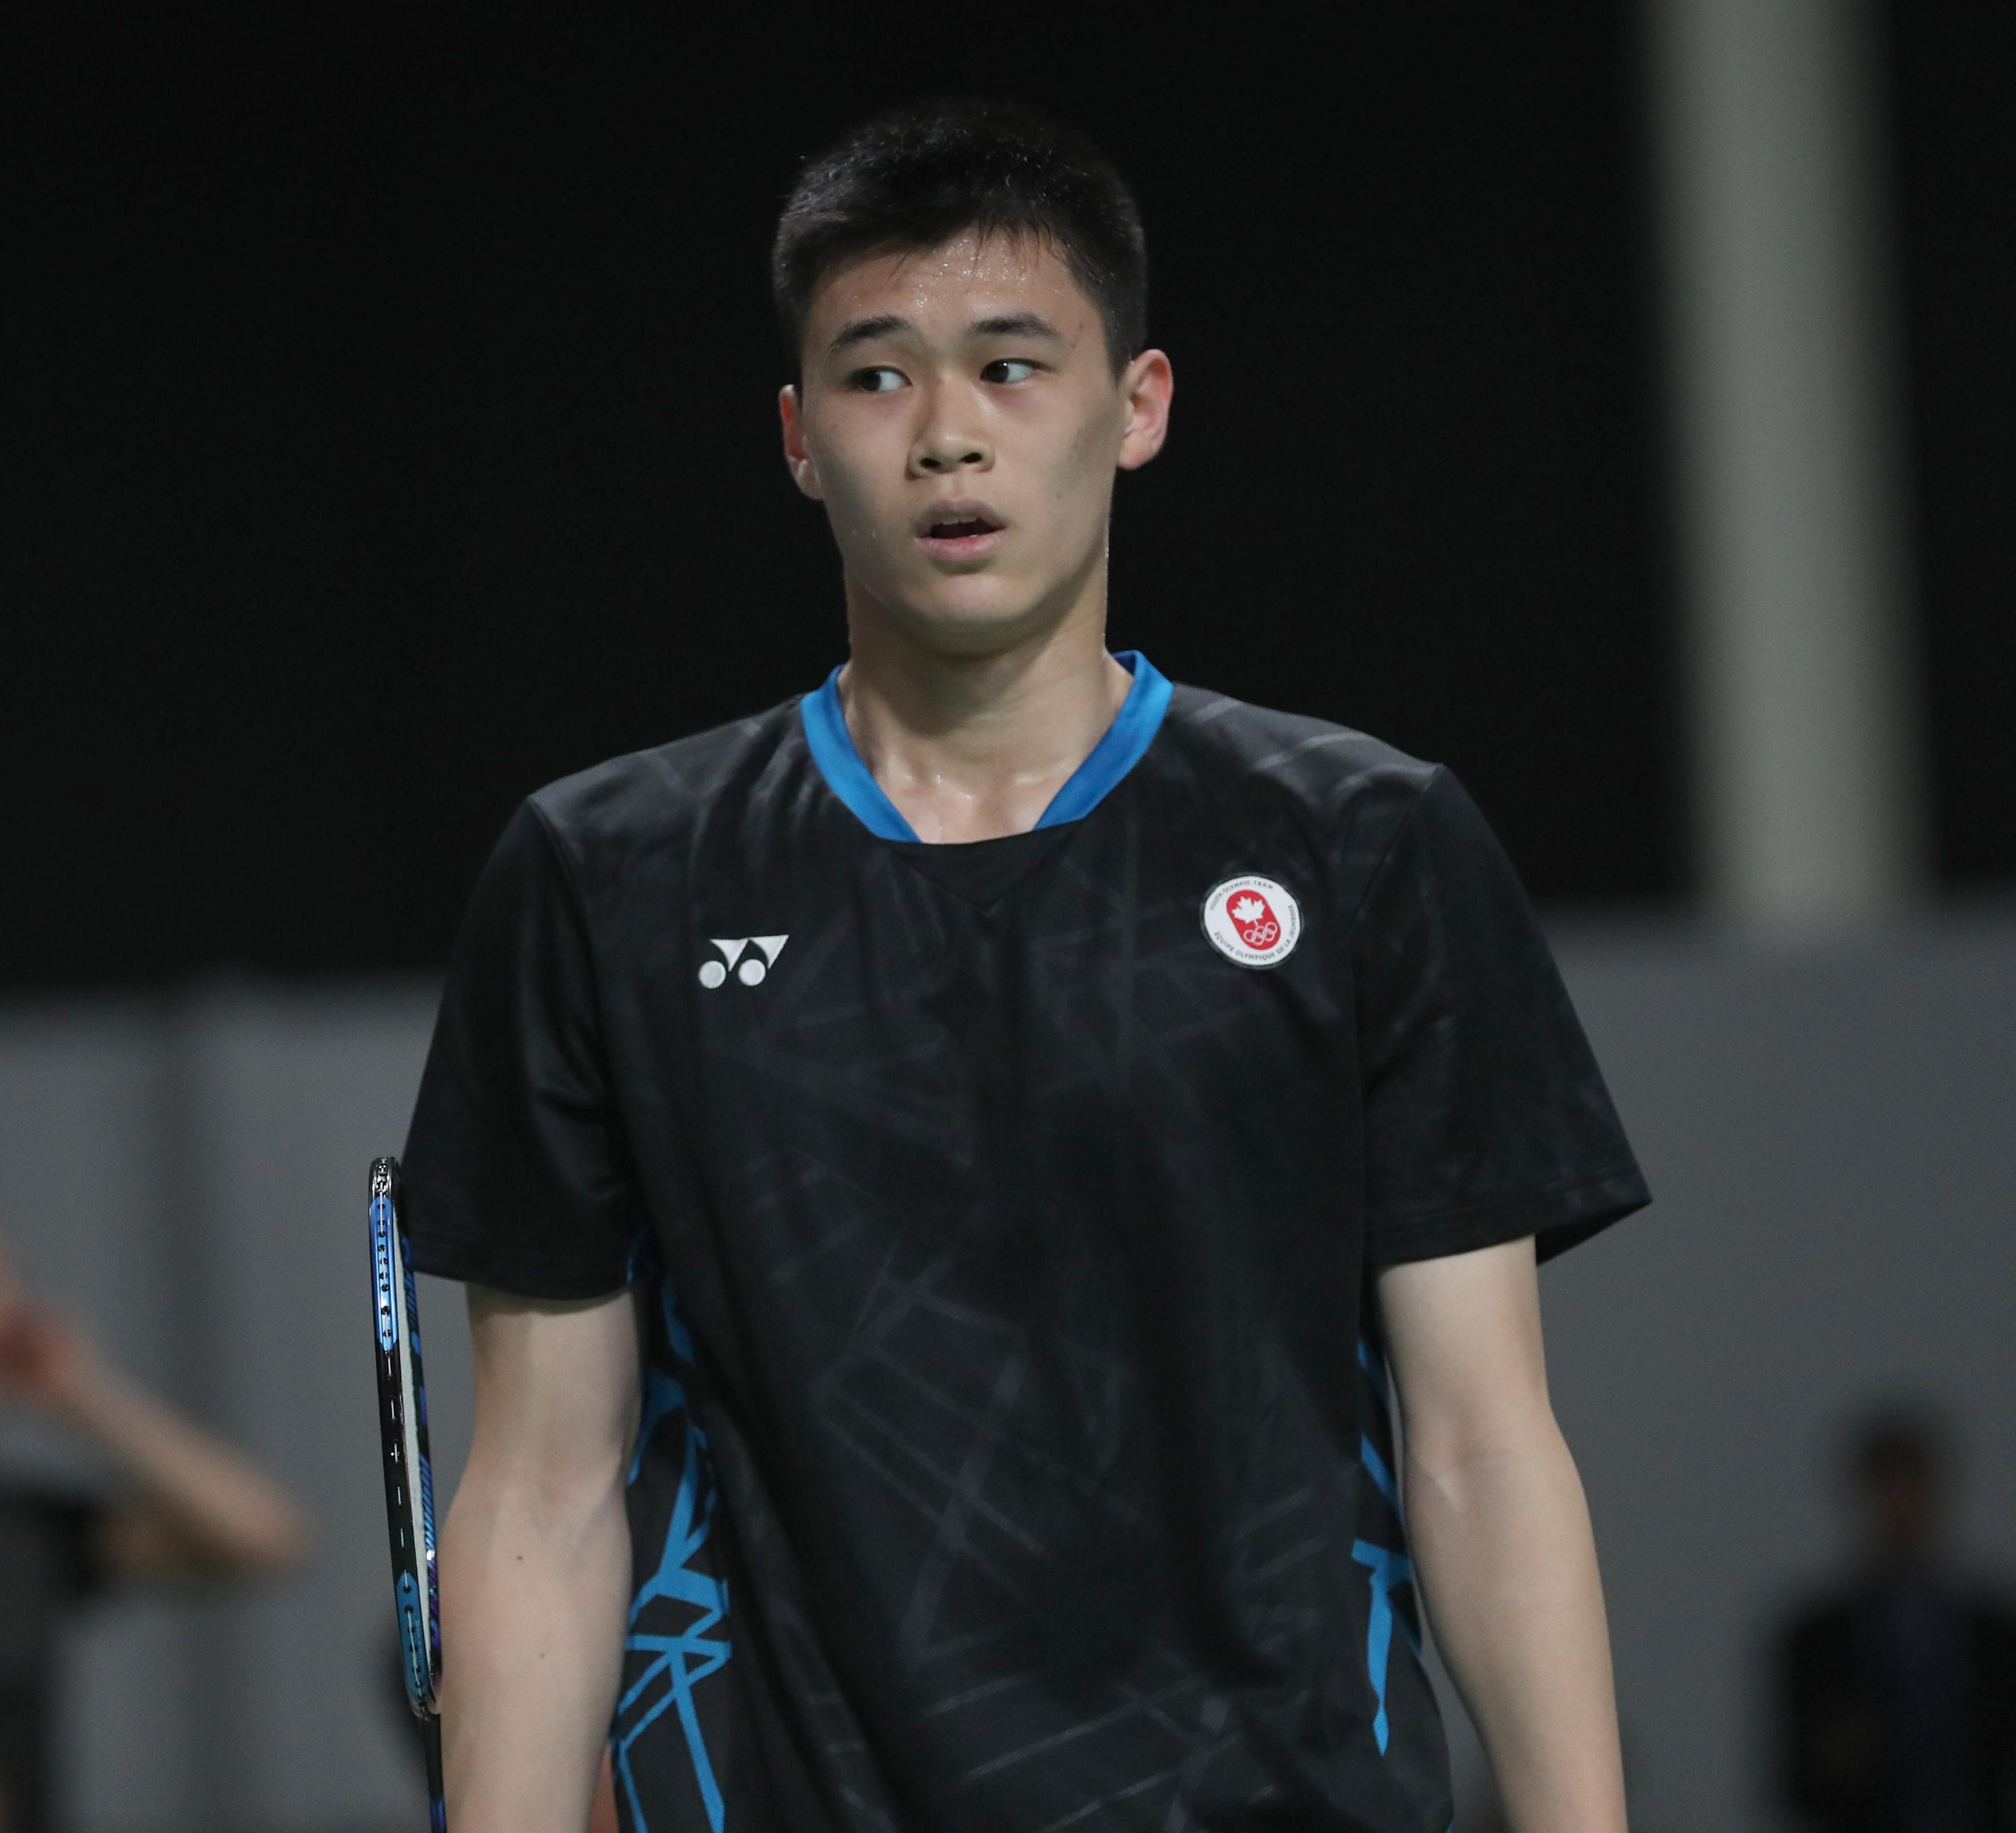 Brian Yang Badminton Wikipedia